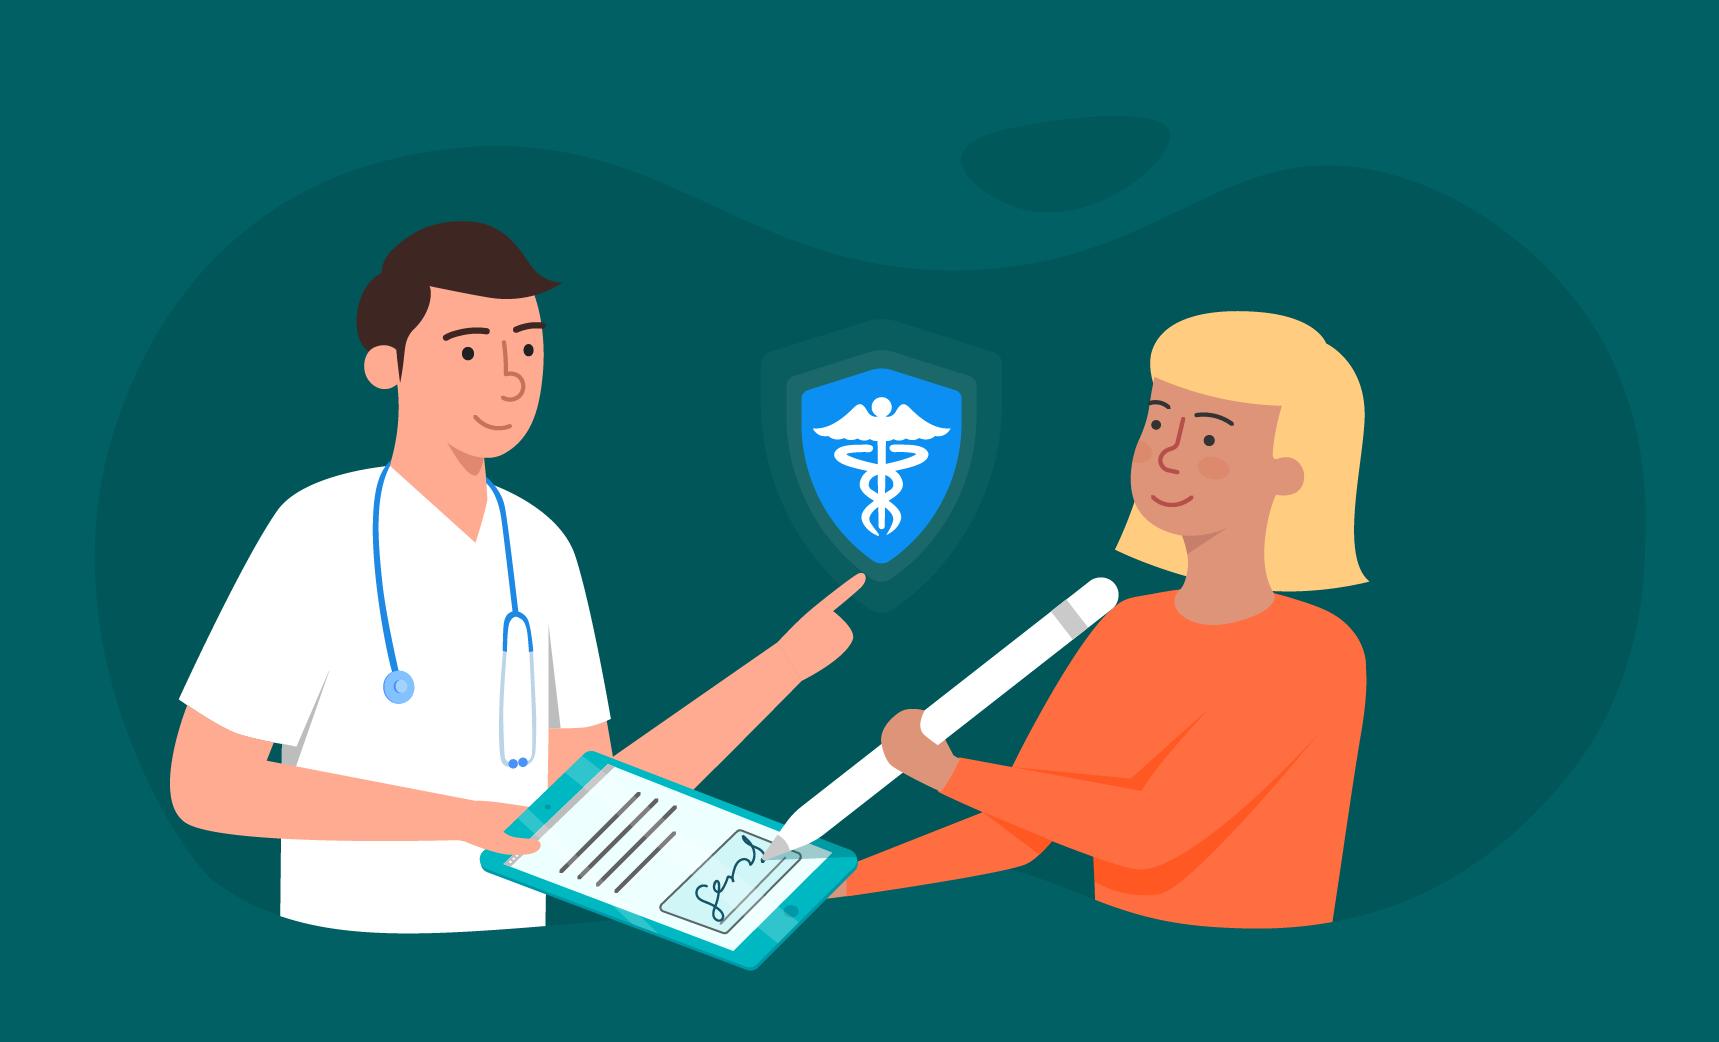 What makes e-signatures HIPAA compliant?